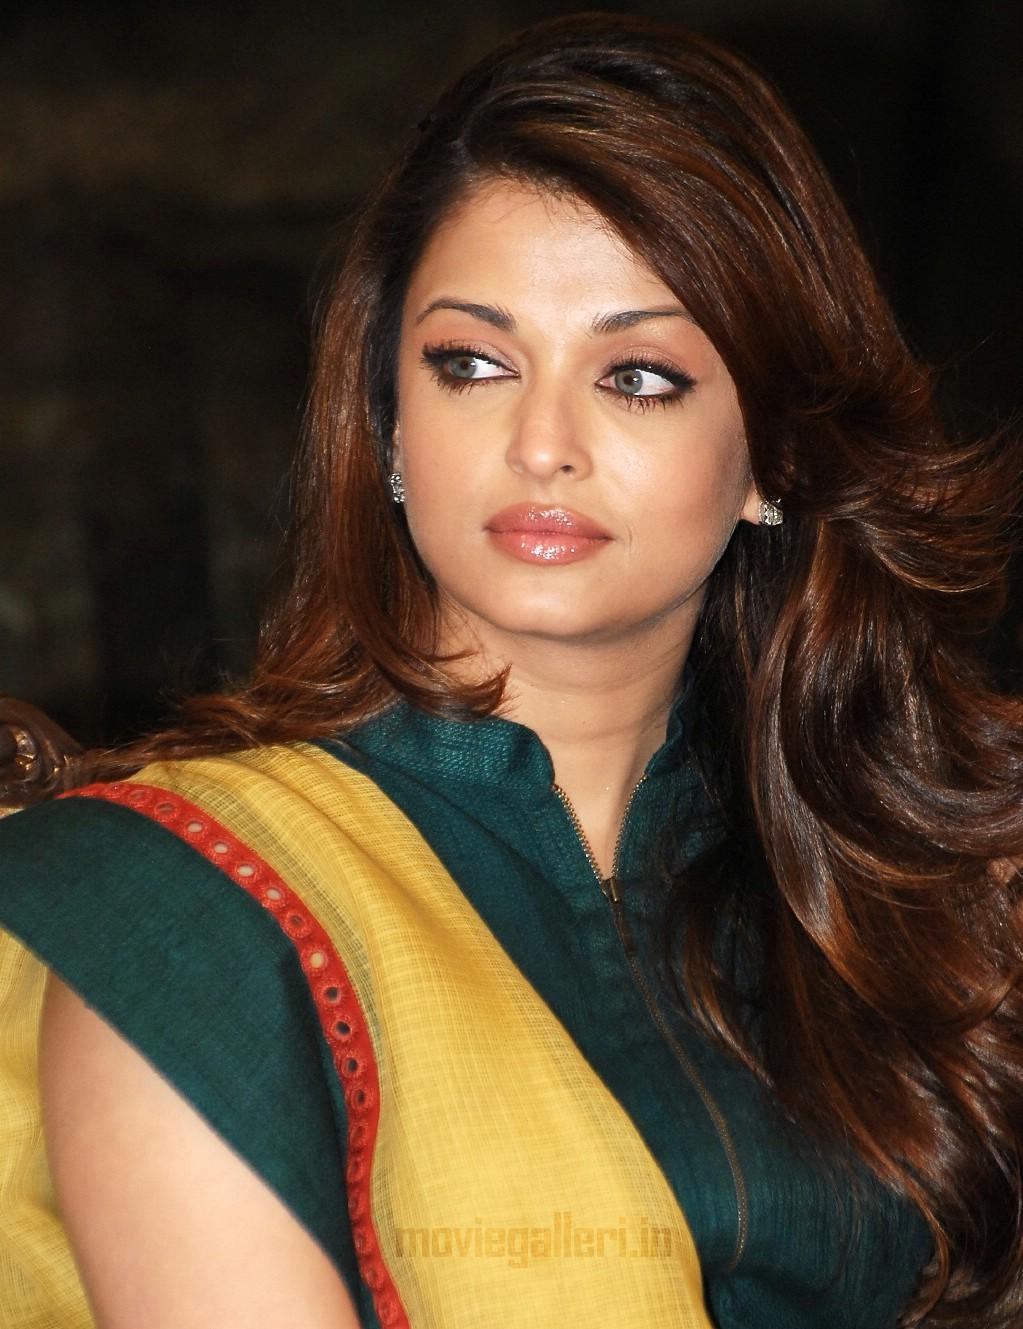 Angelina Jolie Hot Stills aishwarya rai bachchan to copy angelina jolie?